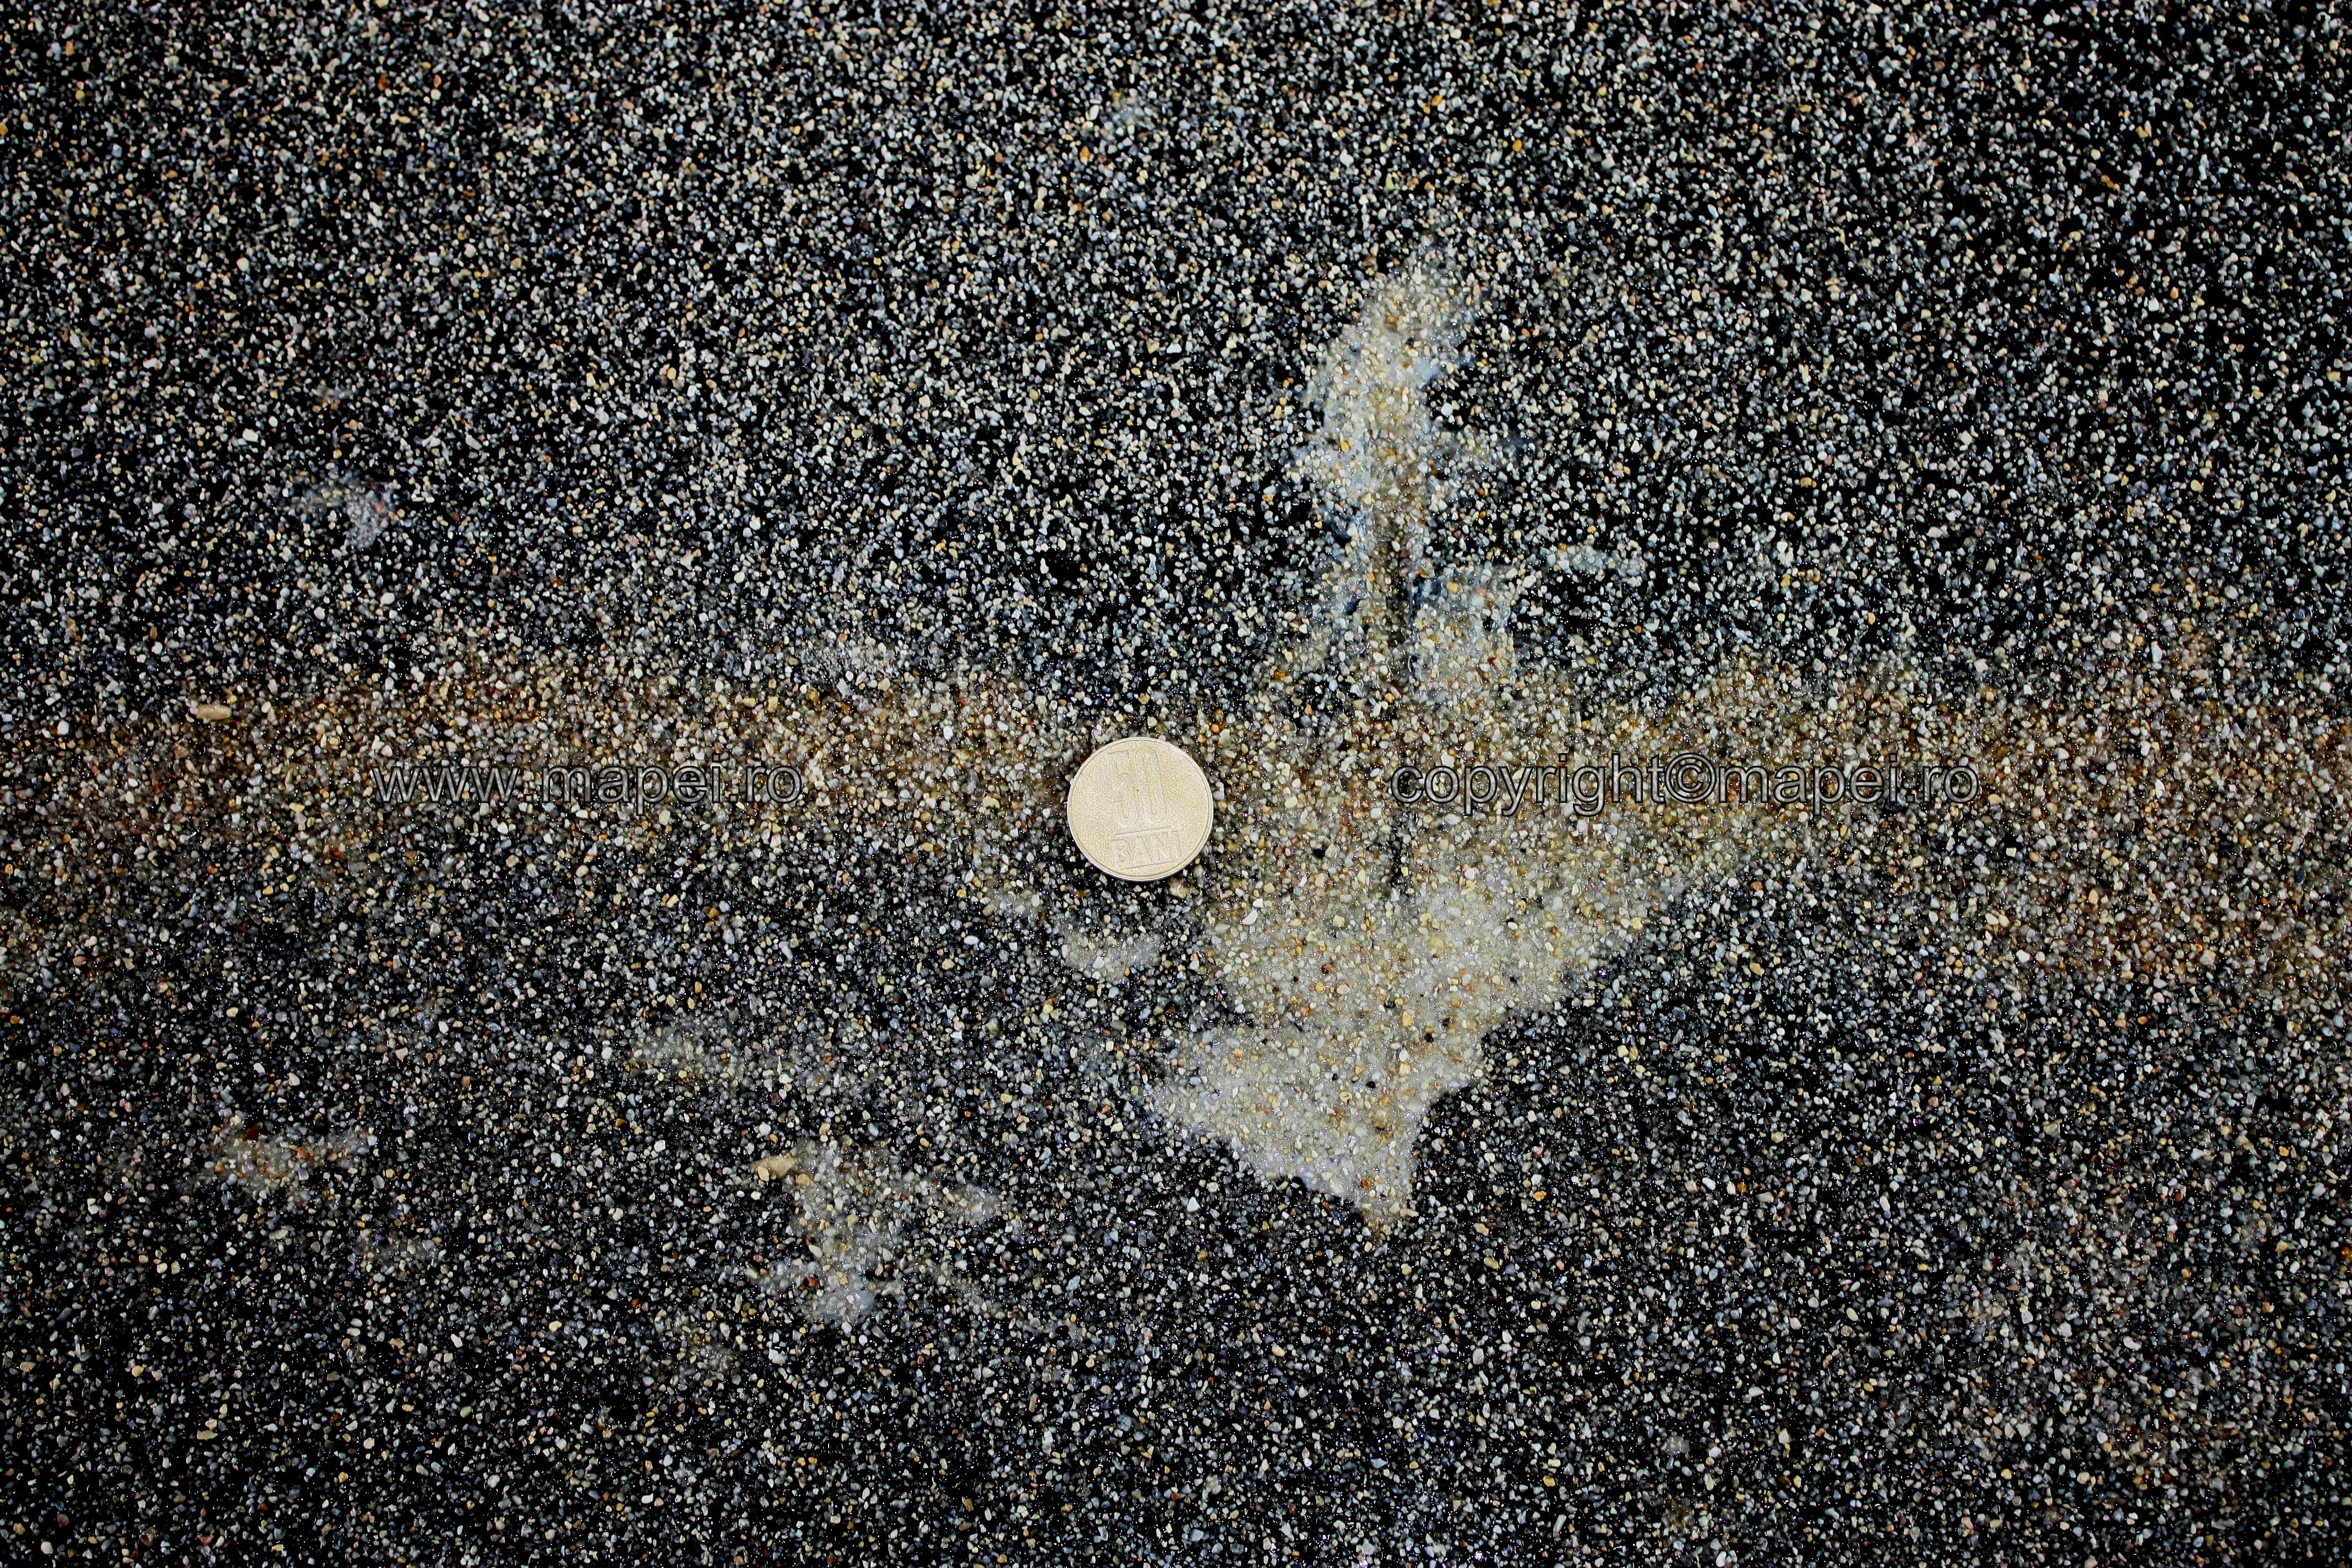 foto 18 - detaliu reparatie si strat epoxi rugos - Galerie 5